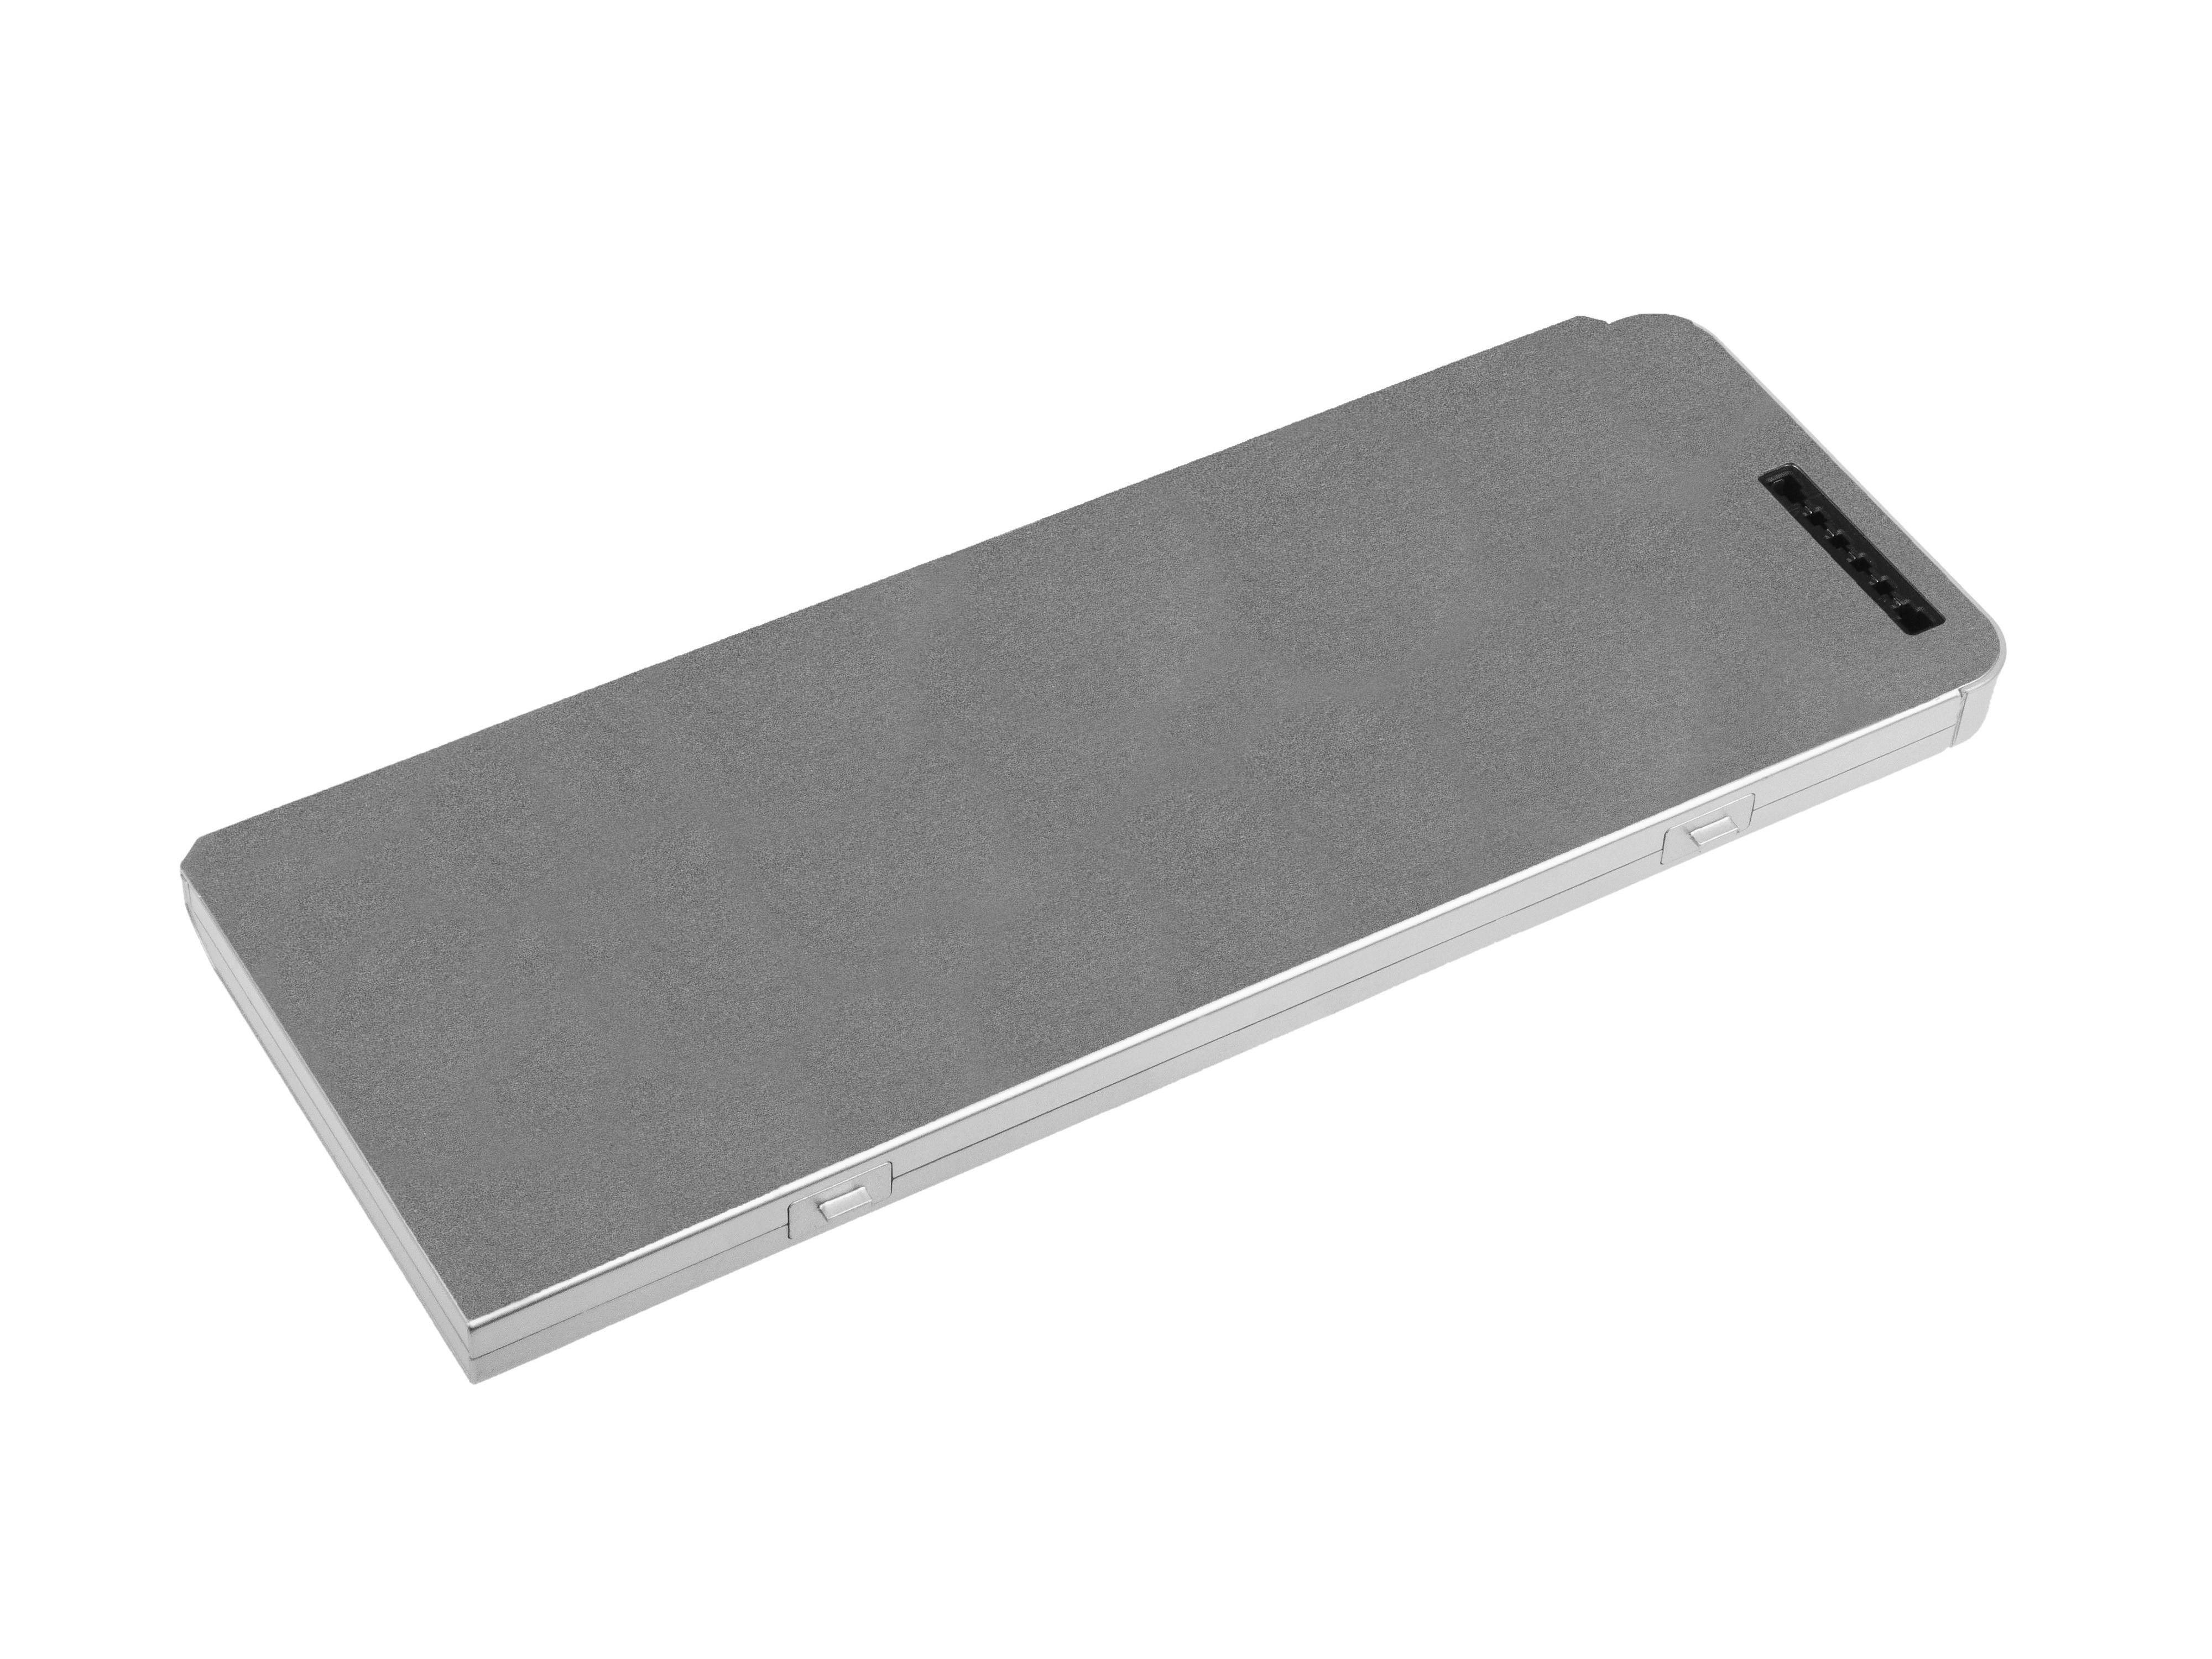 Green Cell Baterie pro Apple Macbook 13 A1278 Aluminum Unibody (Late 2008) / 11,1V 4200mAh